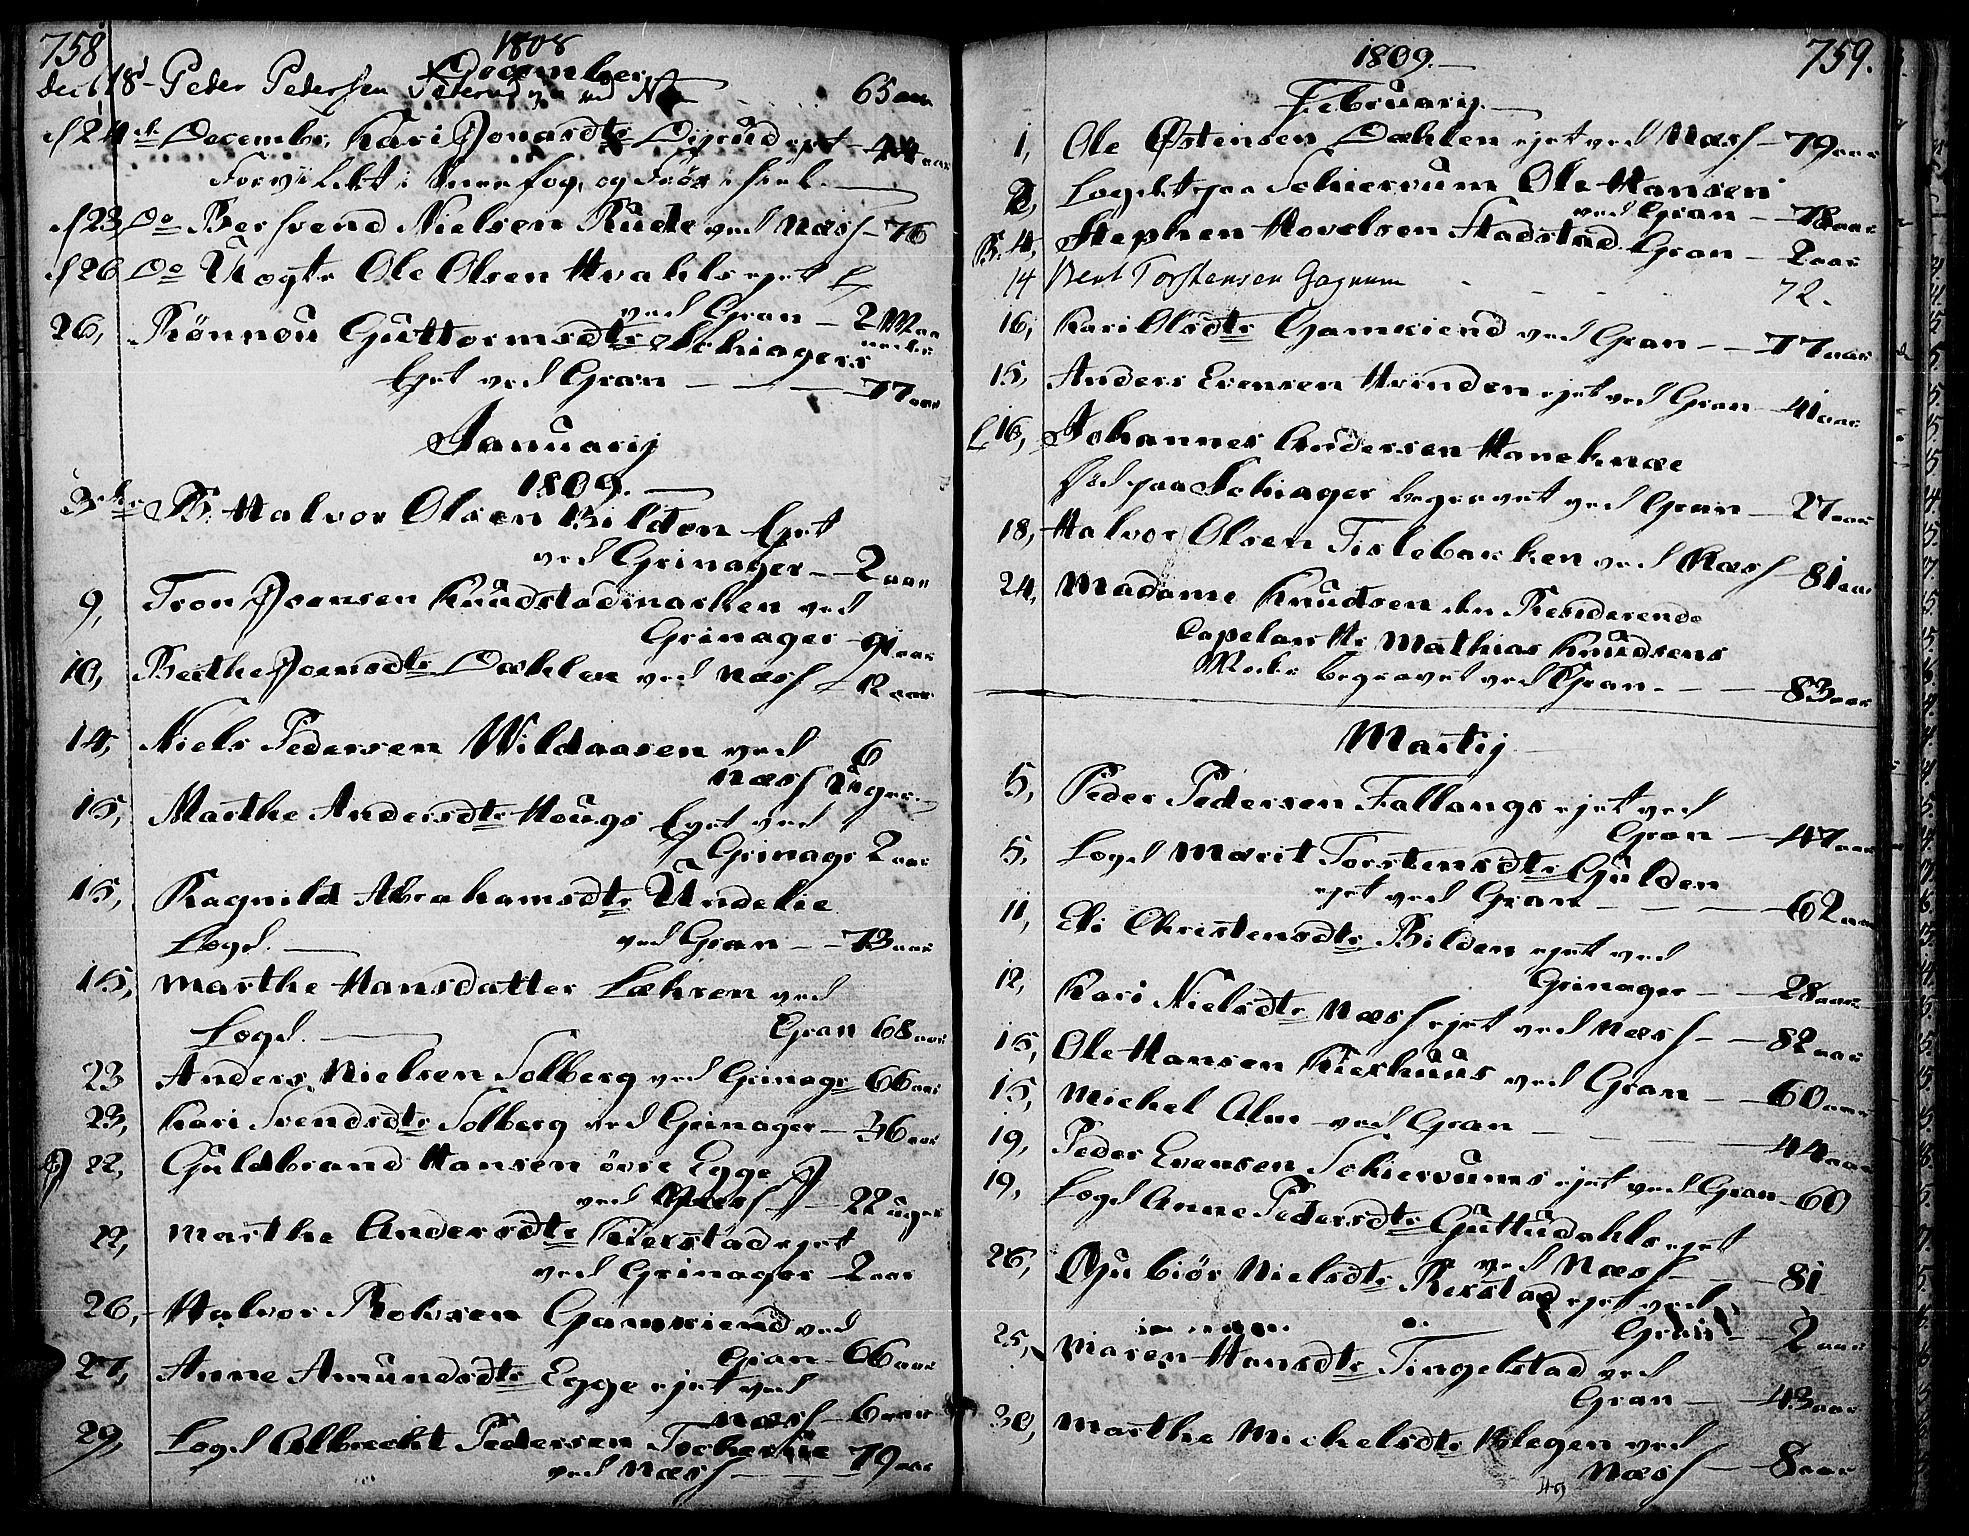 SAH, Gran prestekontor, Ministerialbok nr. 6, 1787-1824, s. 758-759